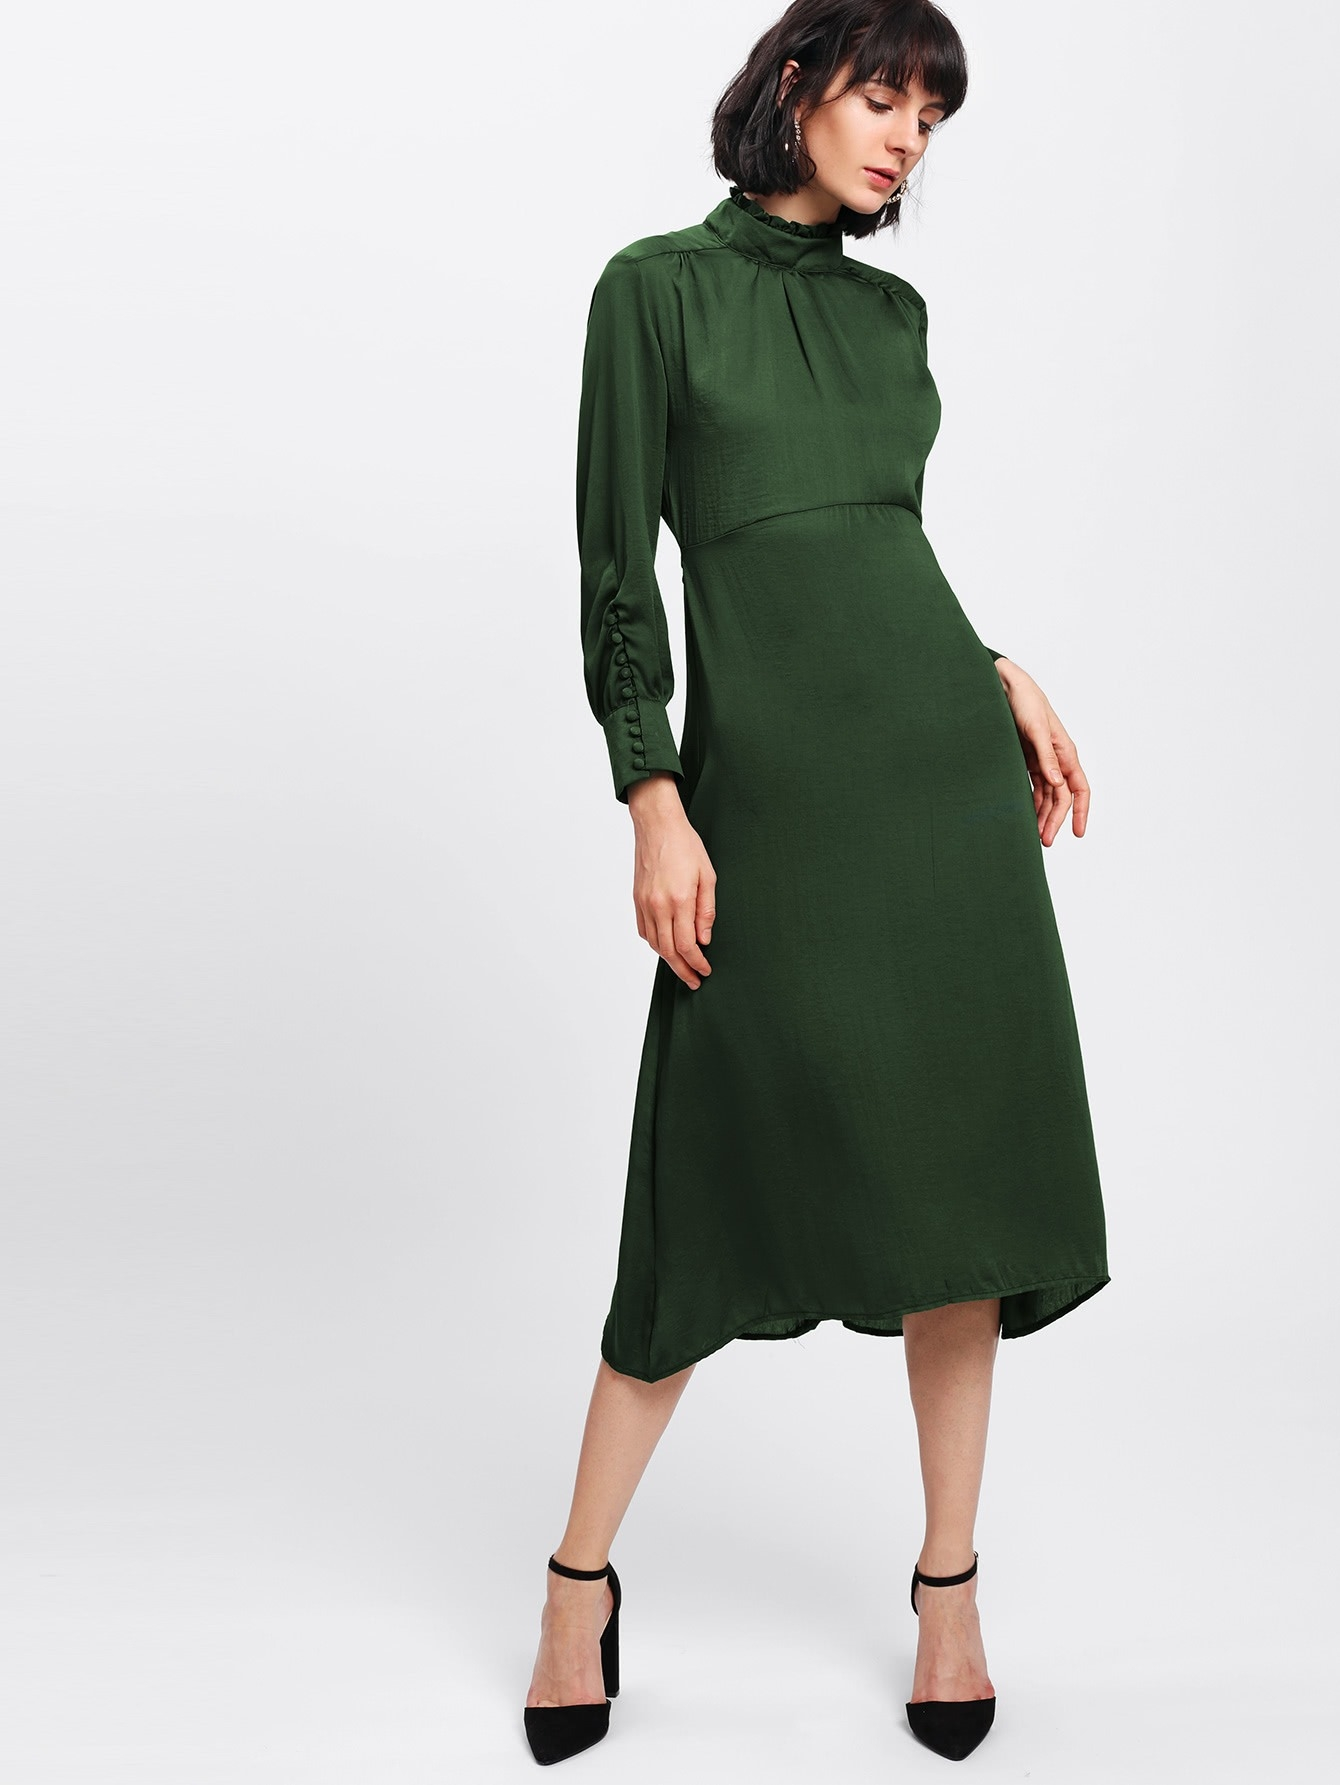 10 perfekt elegante kleider midi Ärmel - abendkleid